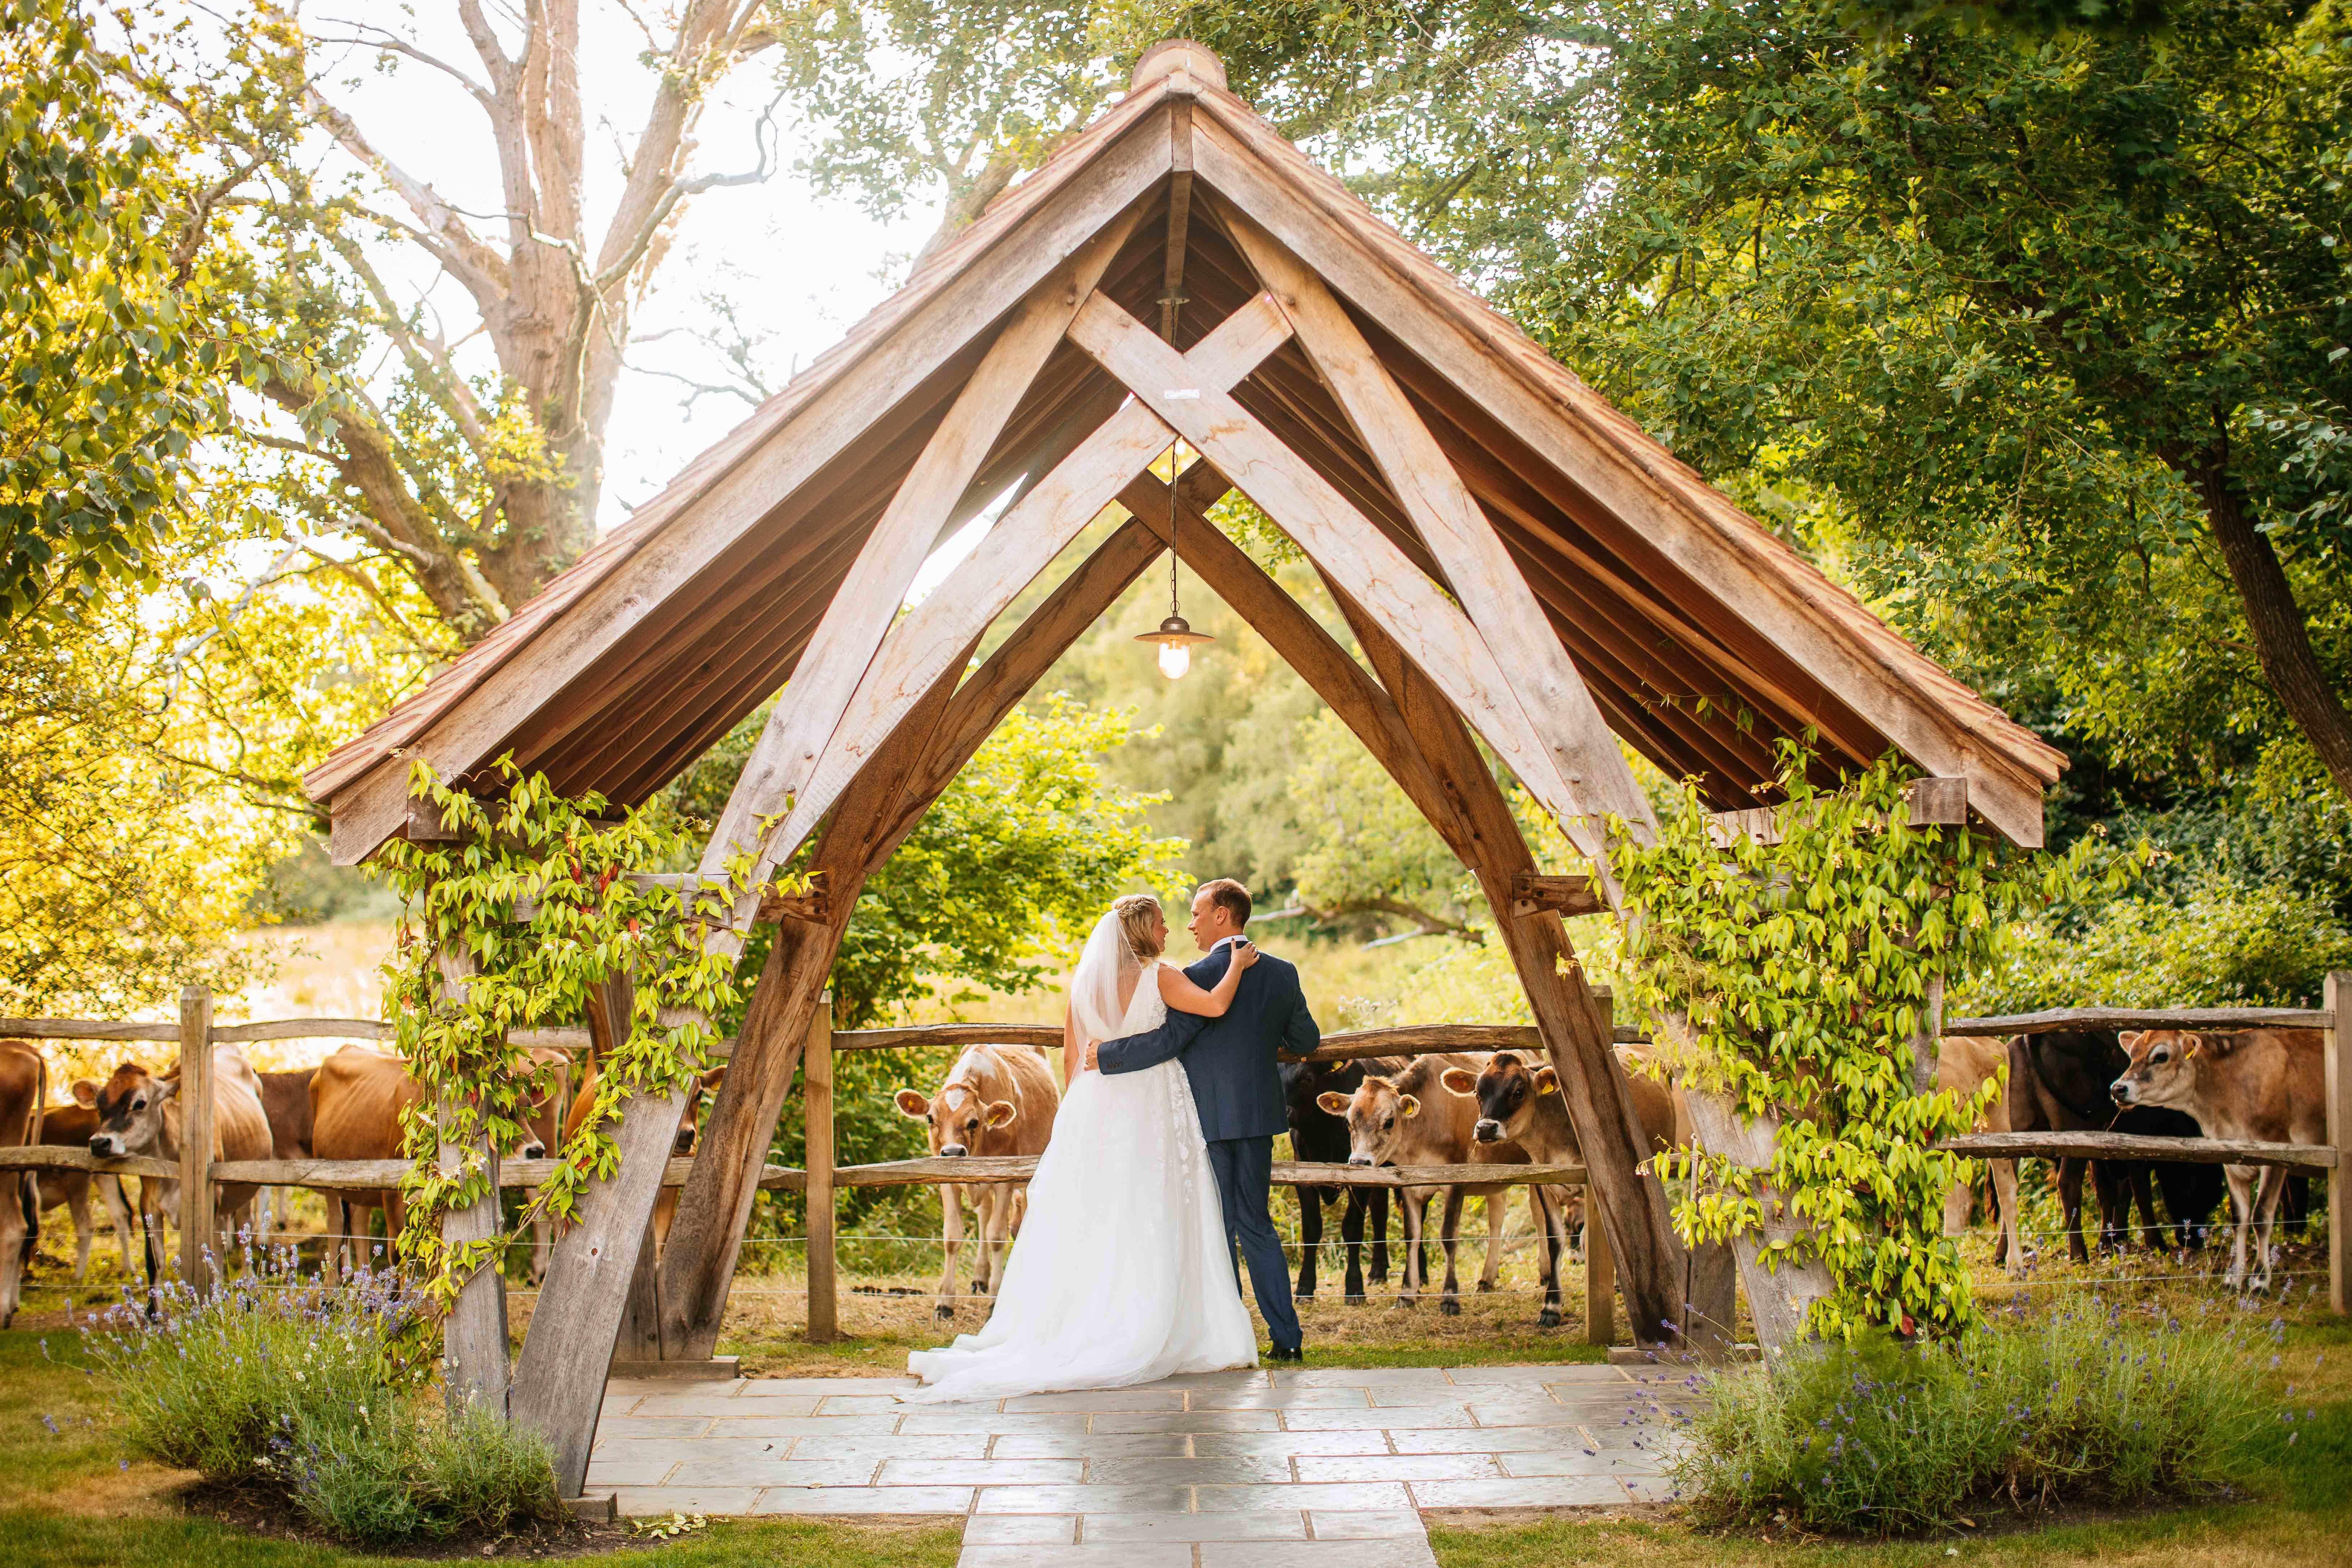 The Arbor @ Millbridge Court| Surrey Wedding Venue ...